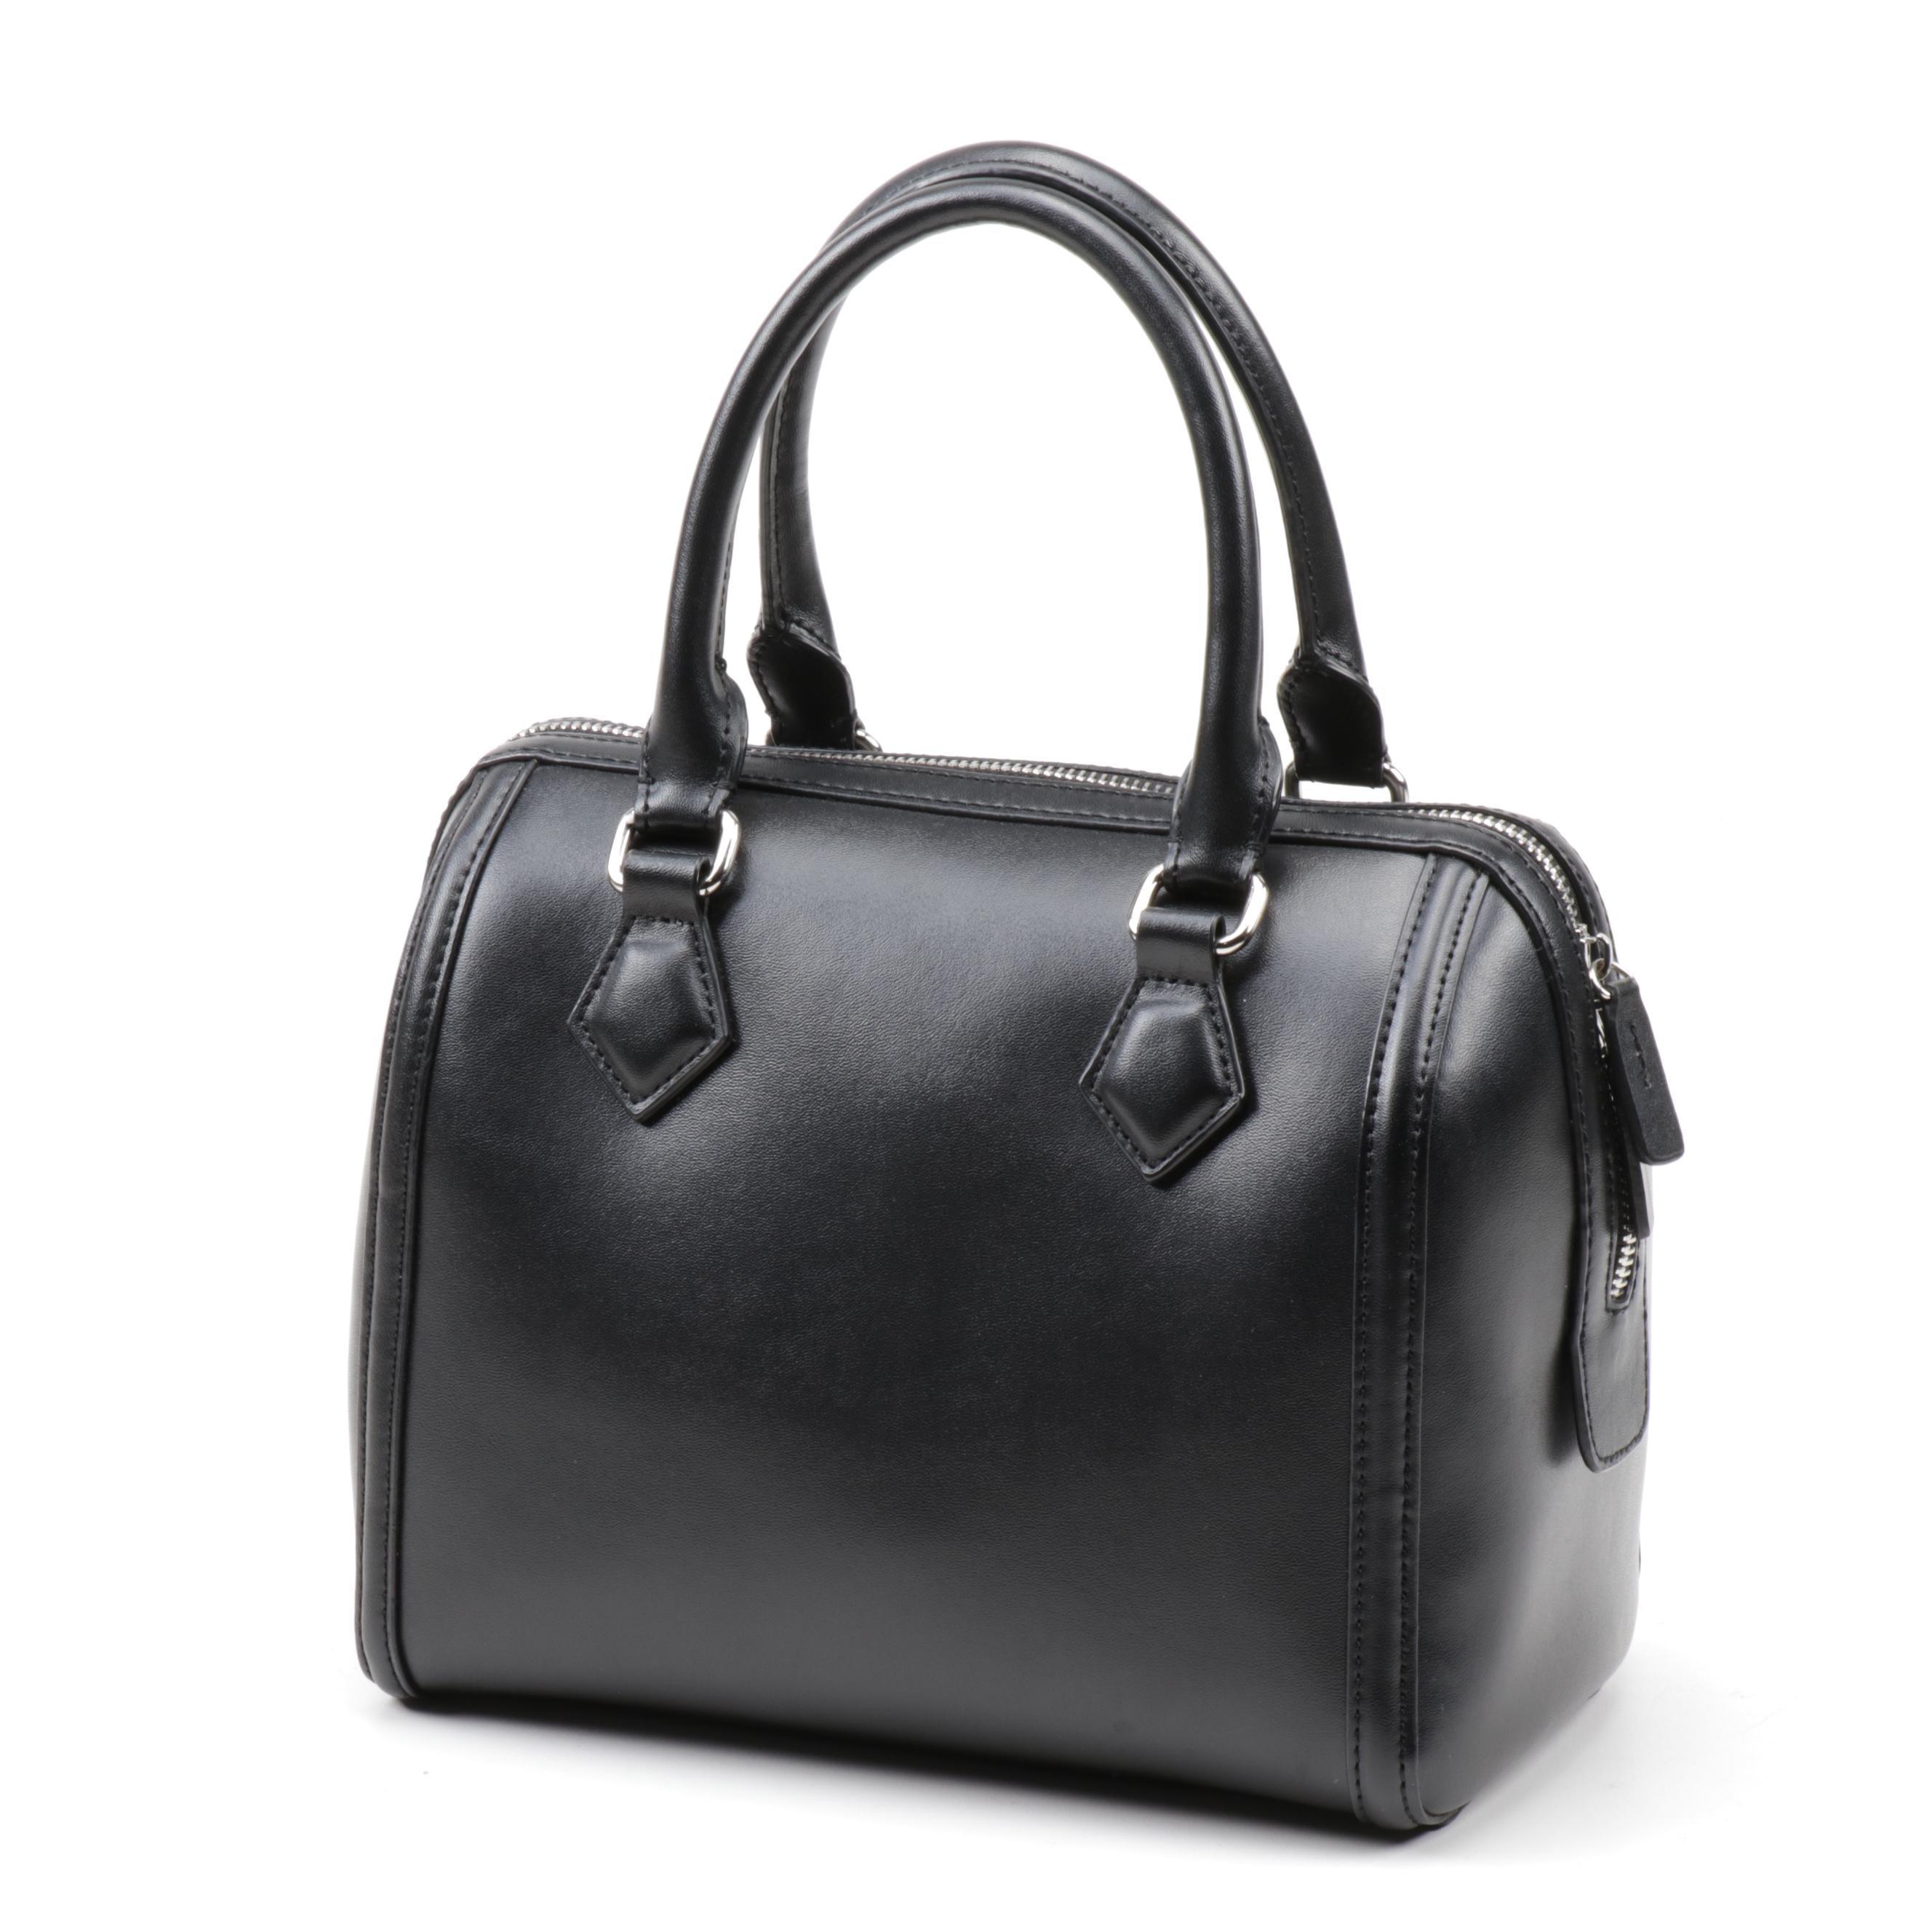 Charles Jourdan Black Leather Satchel